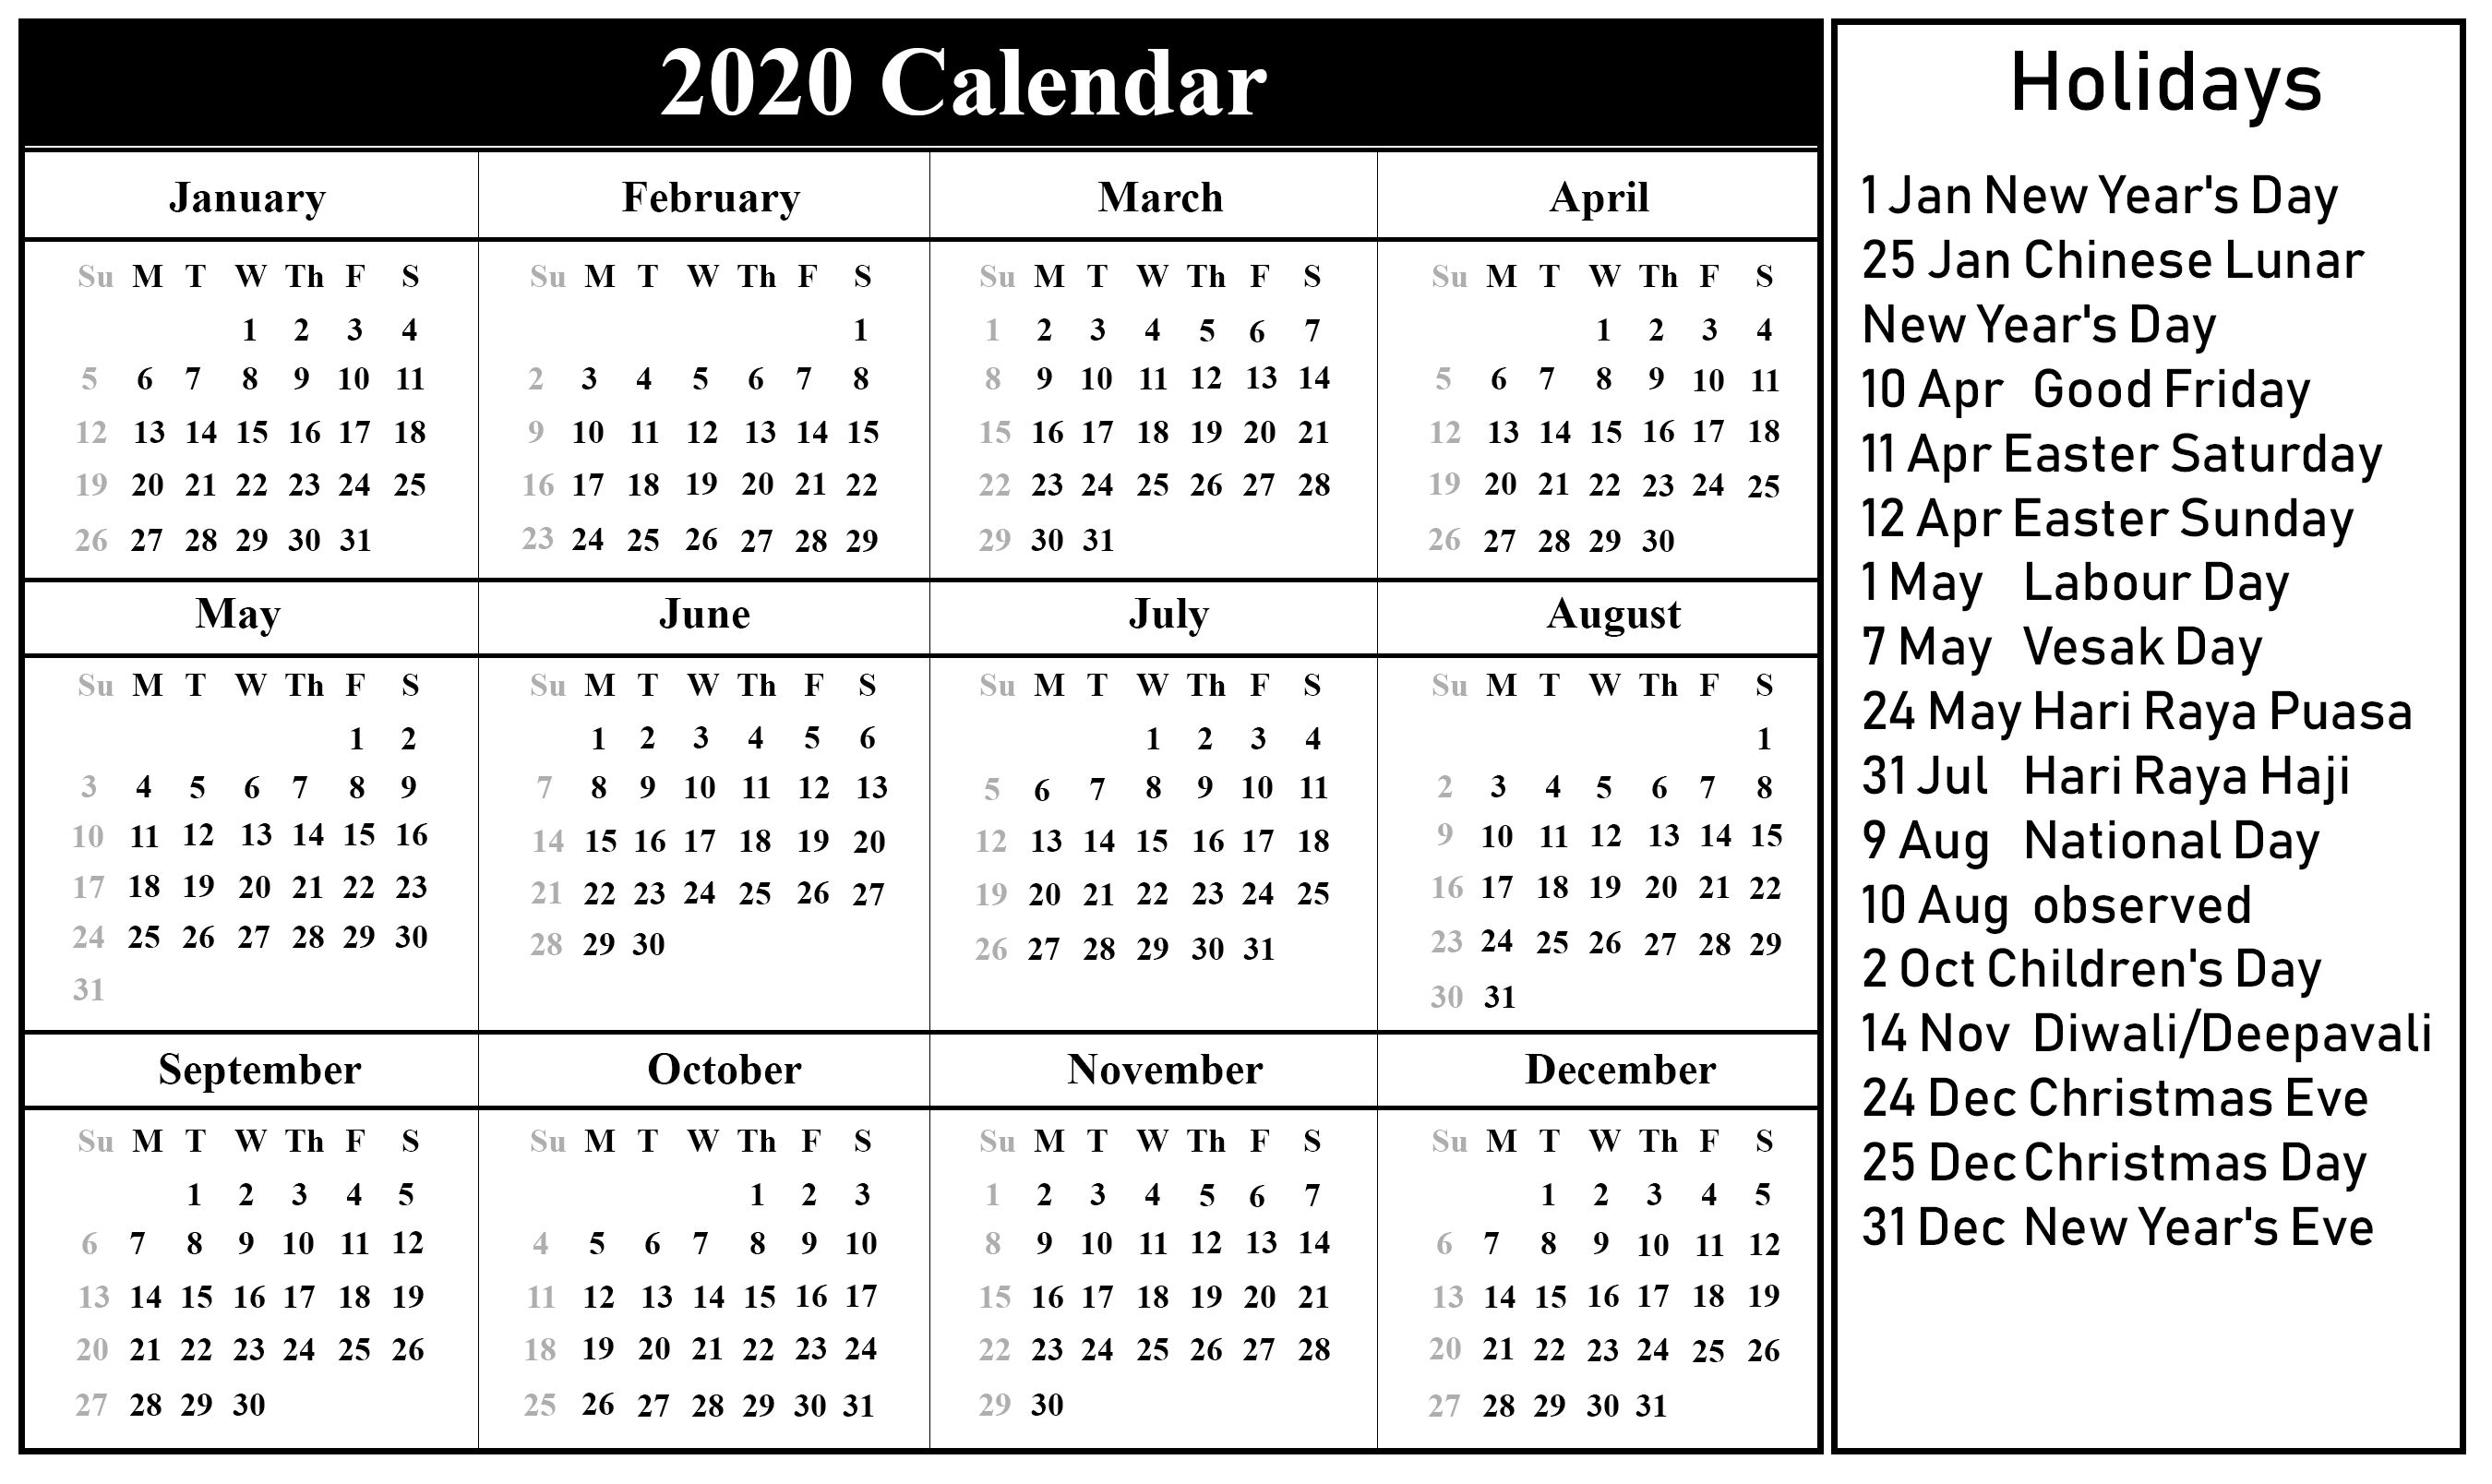 Remarkable Christmas Calendar 2020 Printable Free in 2020